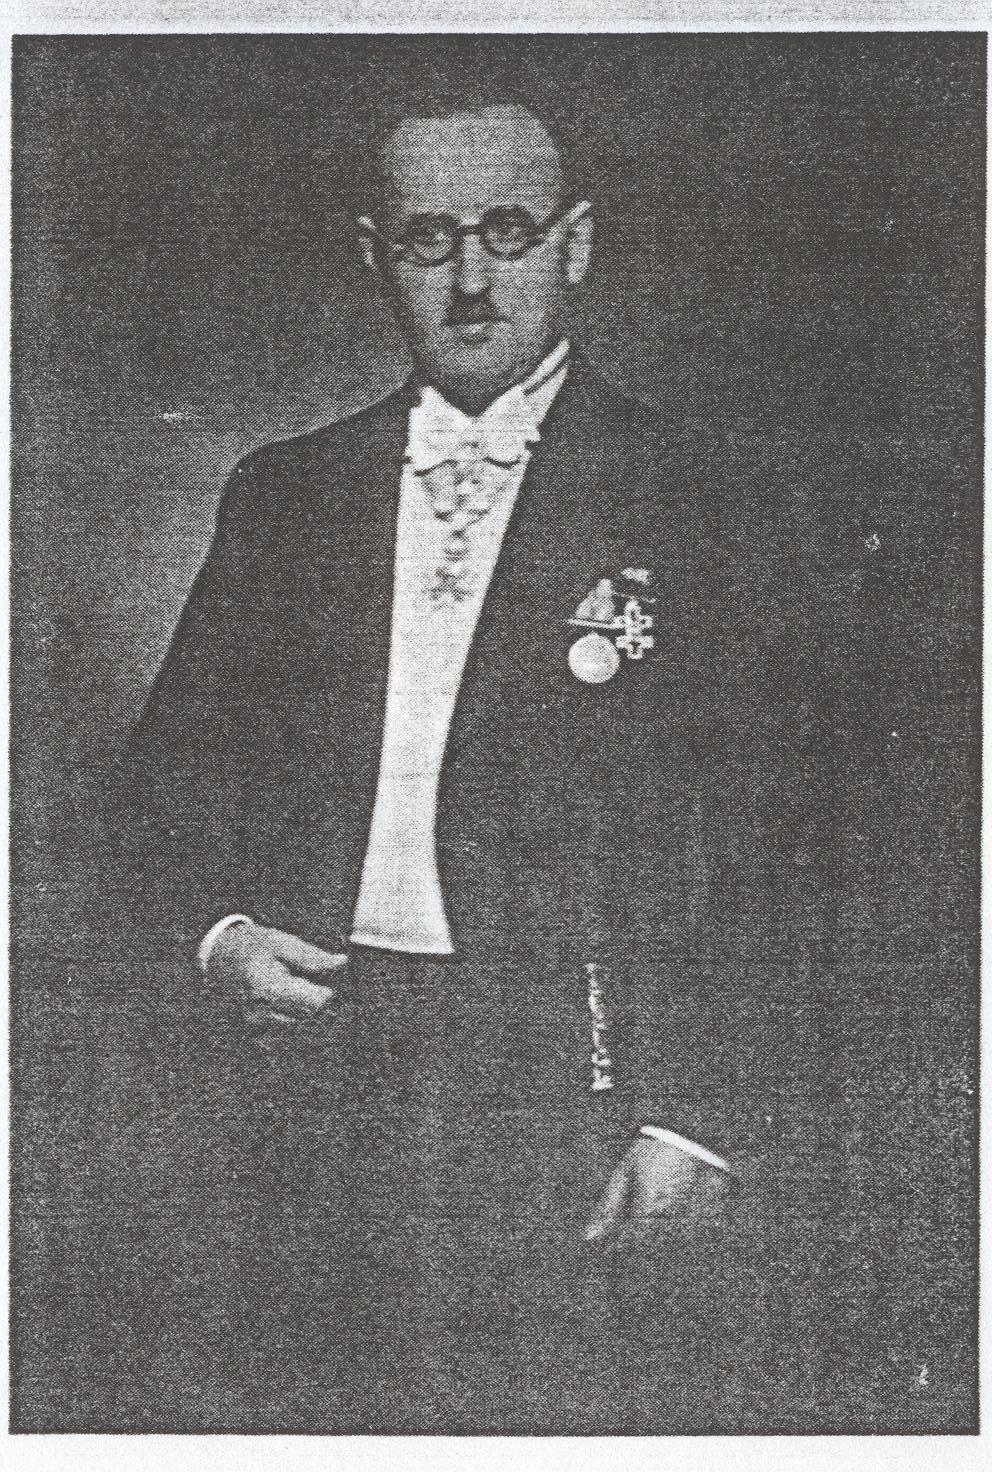 1. Dr. K. Gudaitis